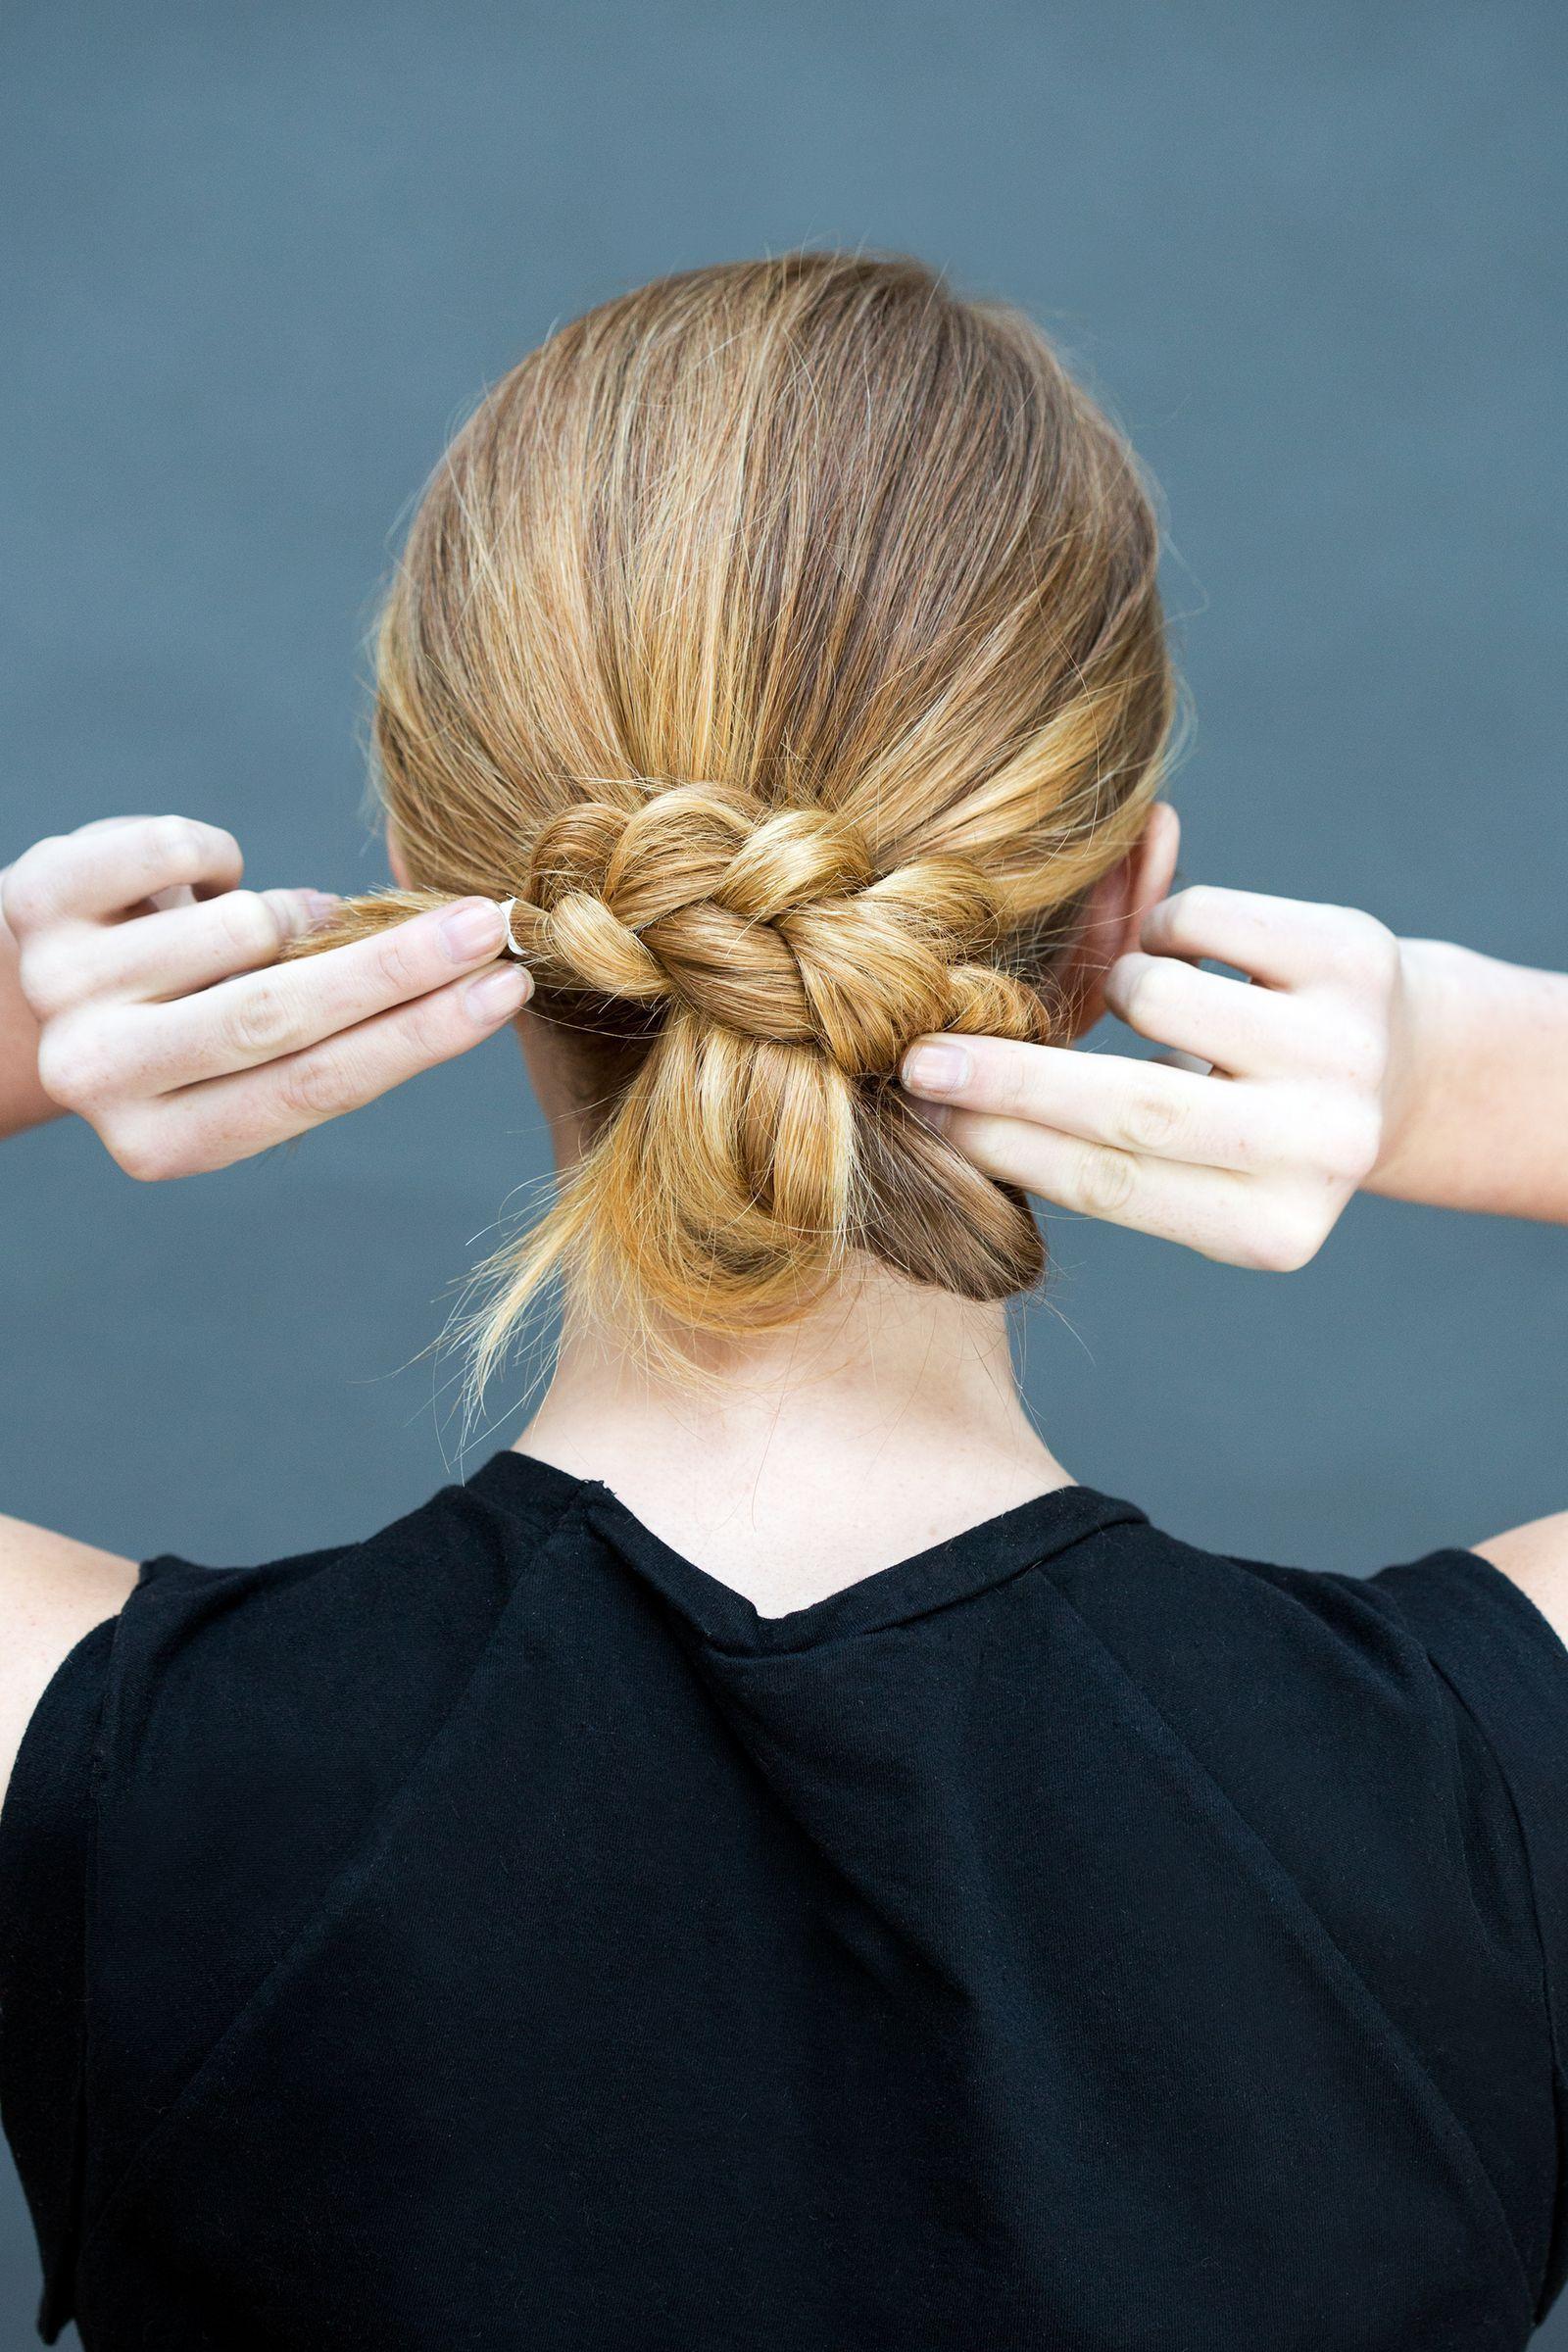 Step make the bun easyhairstyles easy hairstyles in